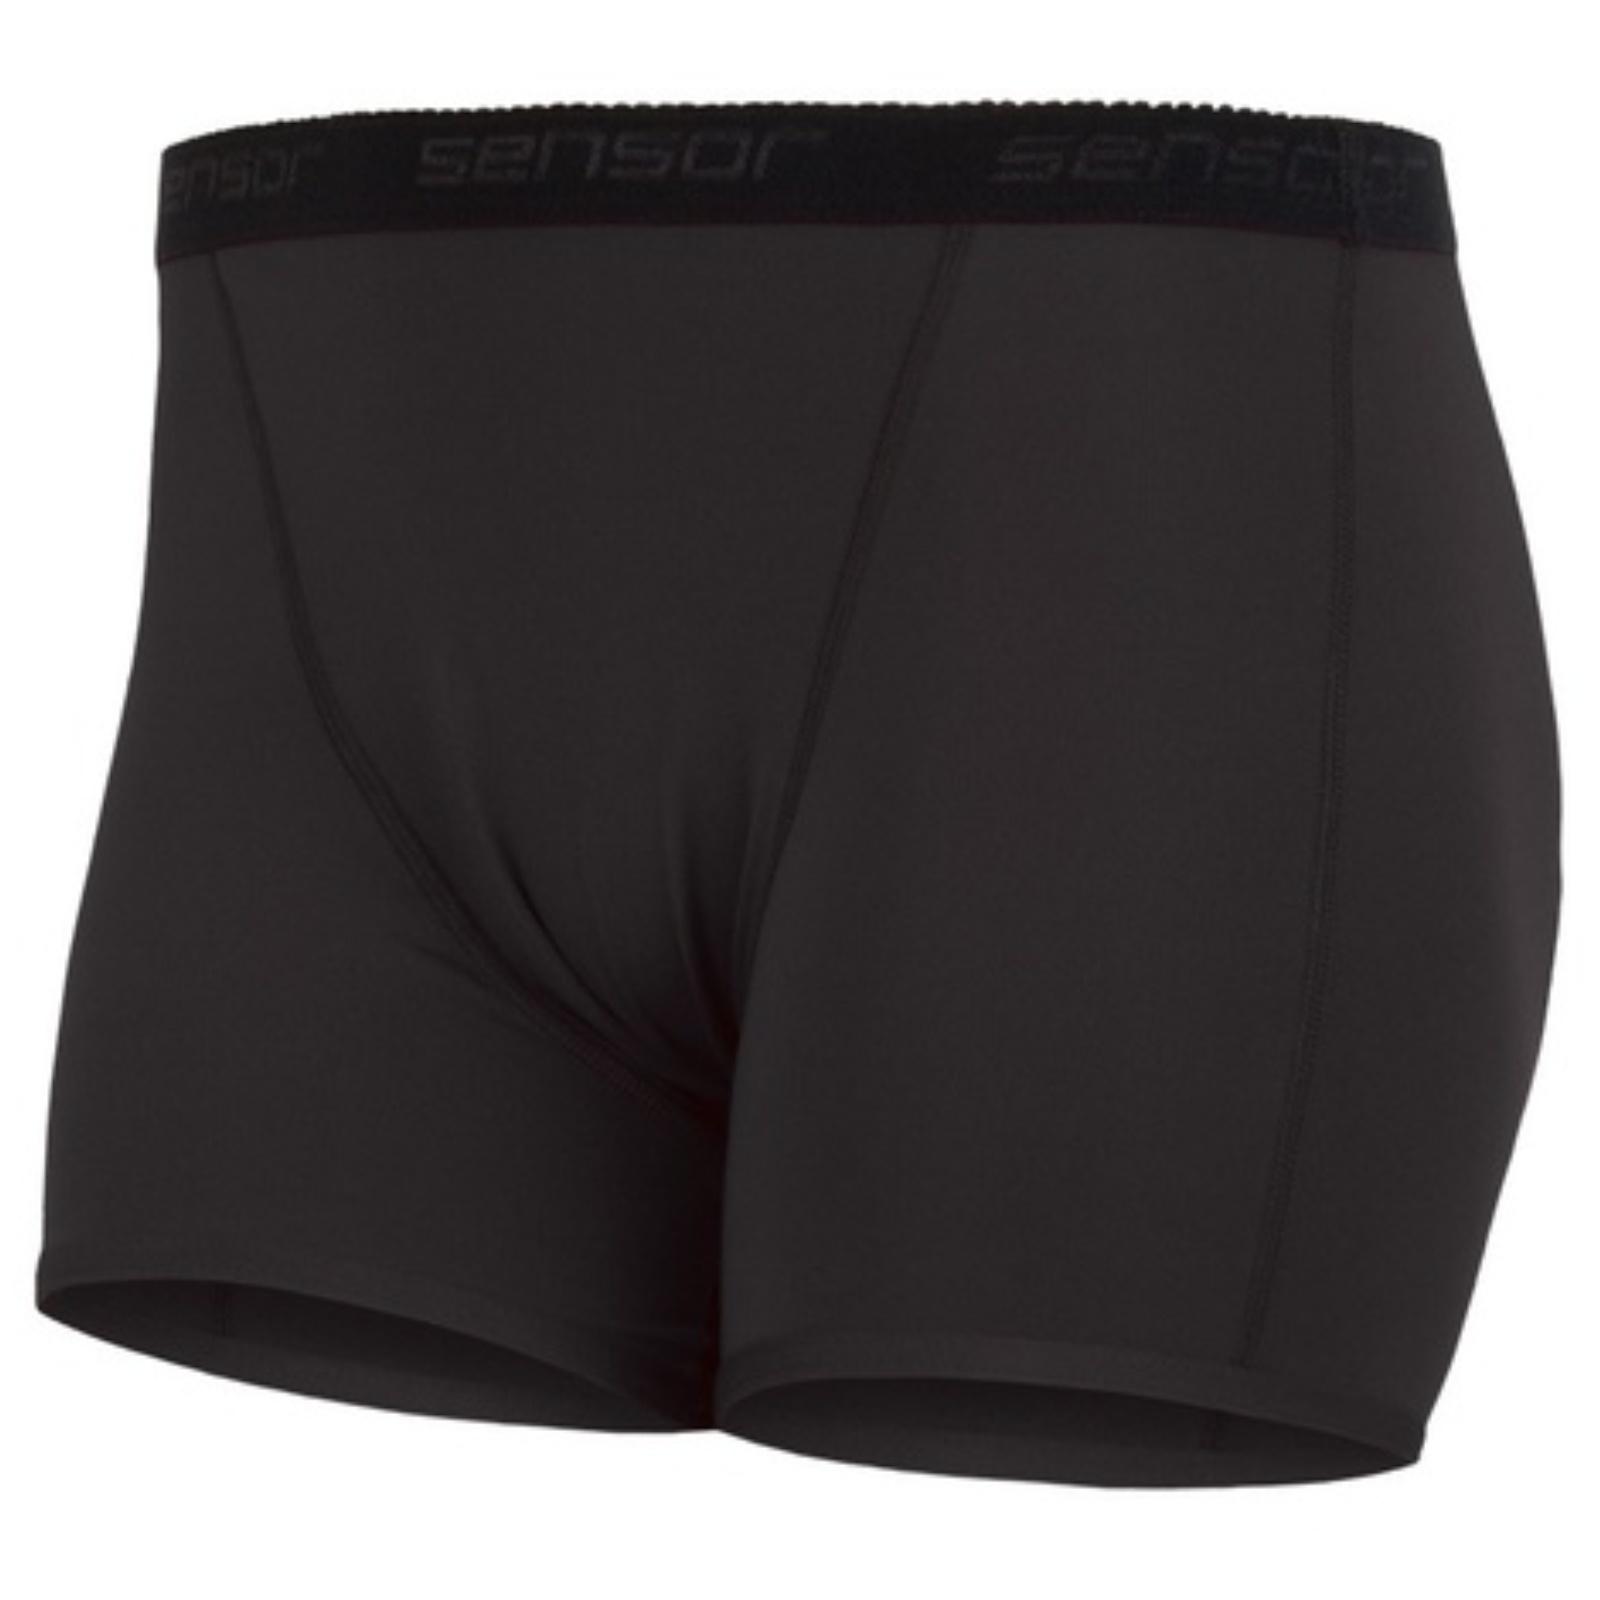 Kalhotky SENSOR Coolmax Fresh černé - vel. XL